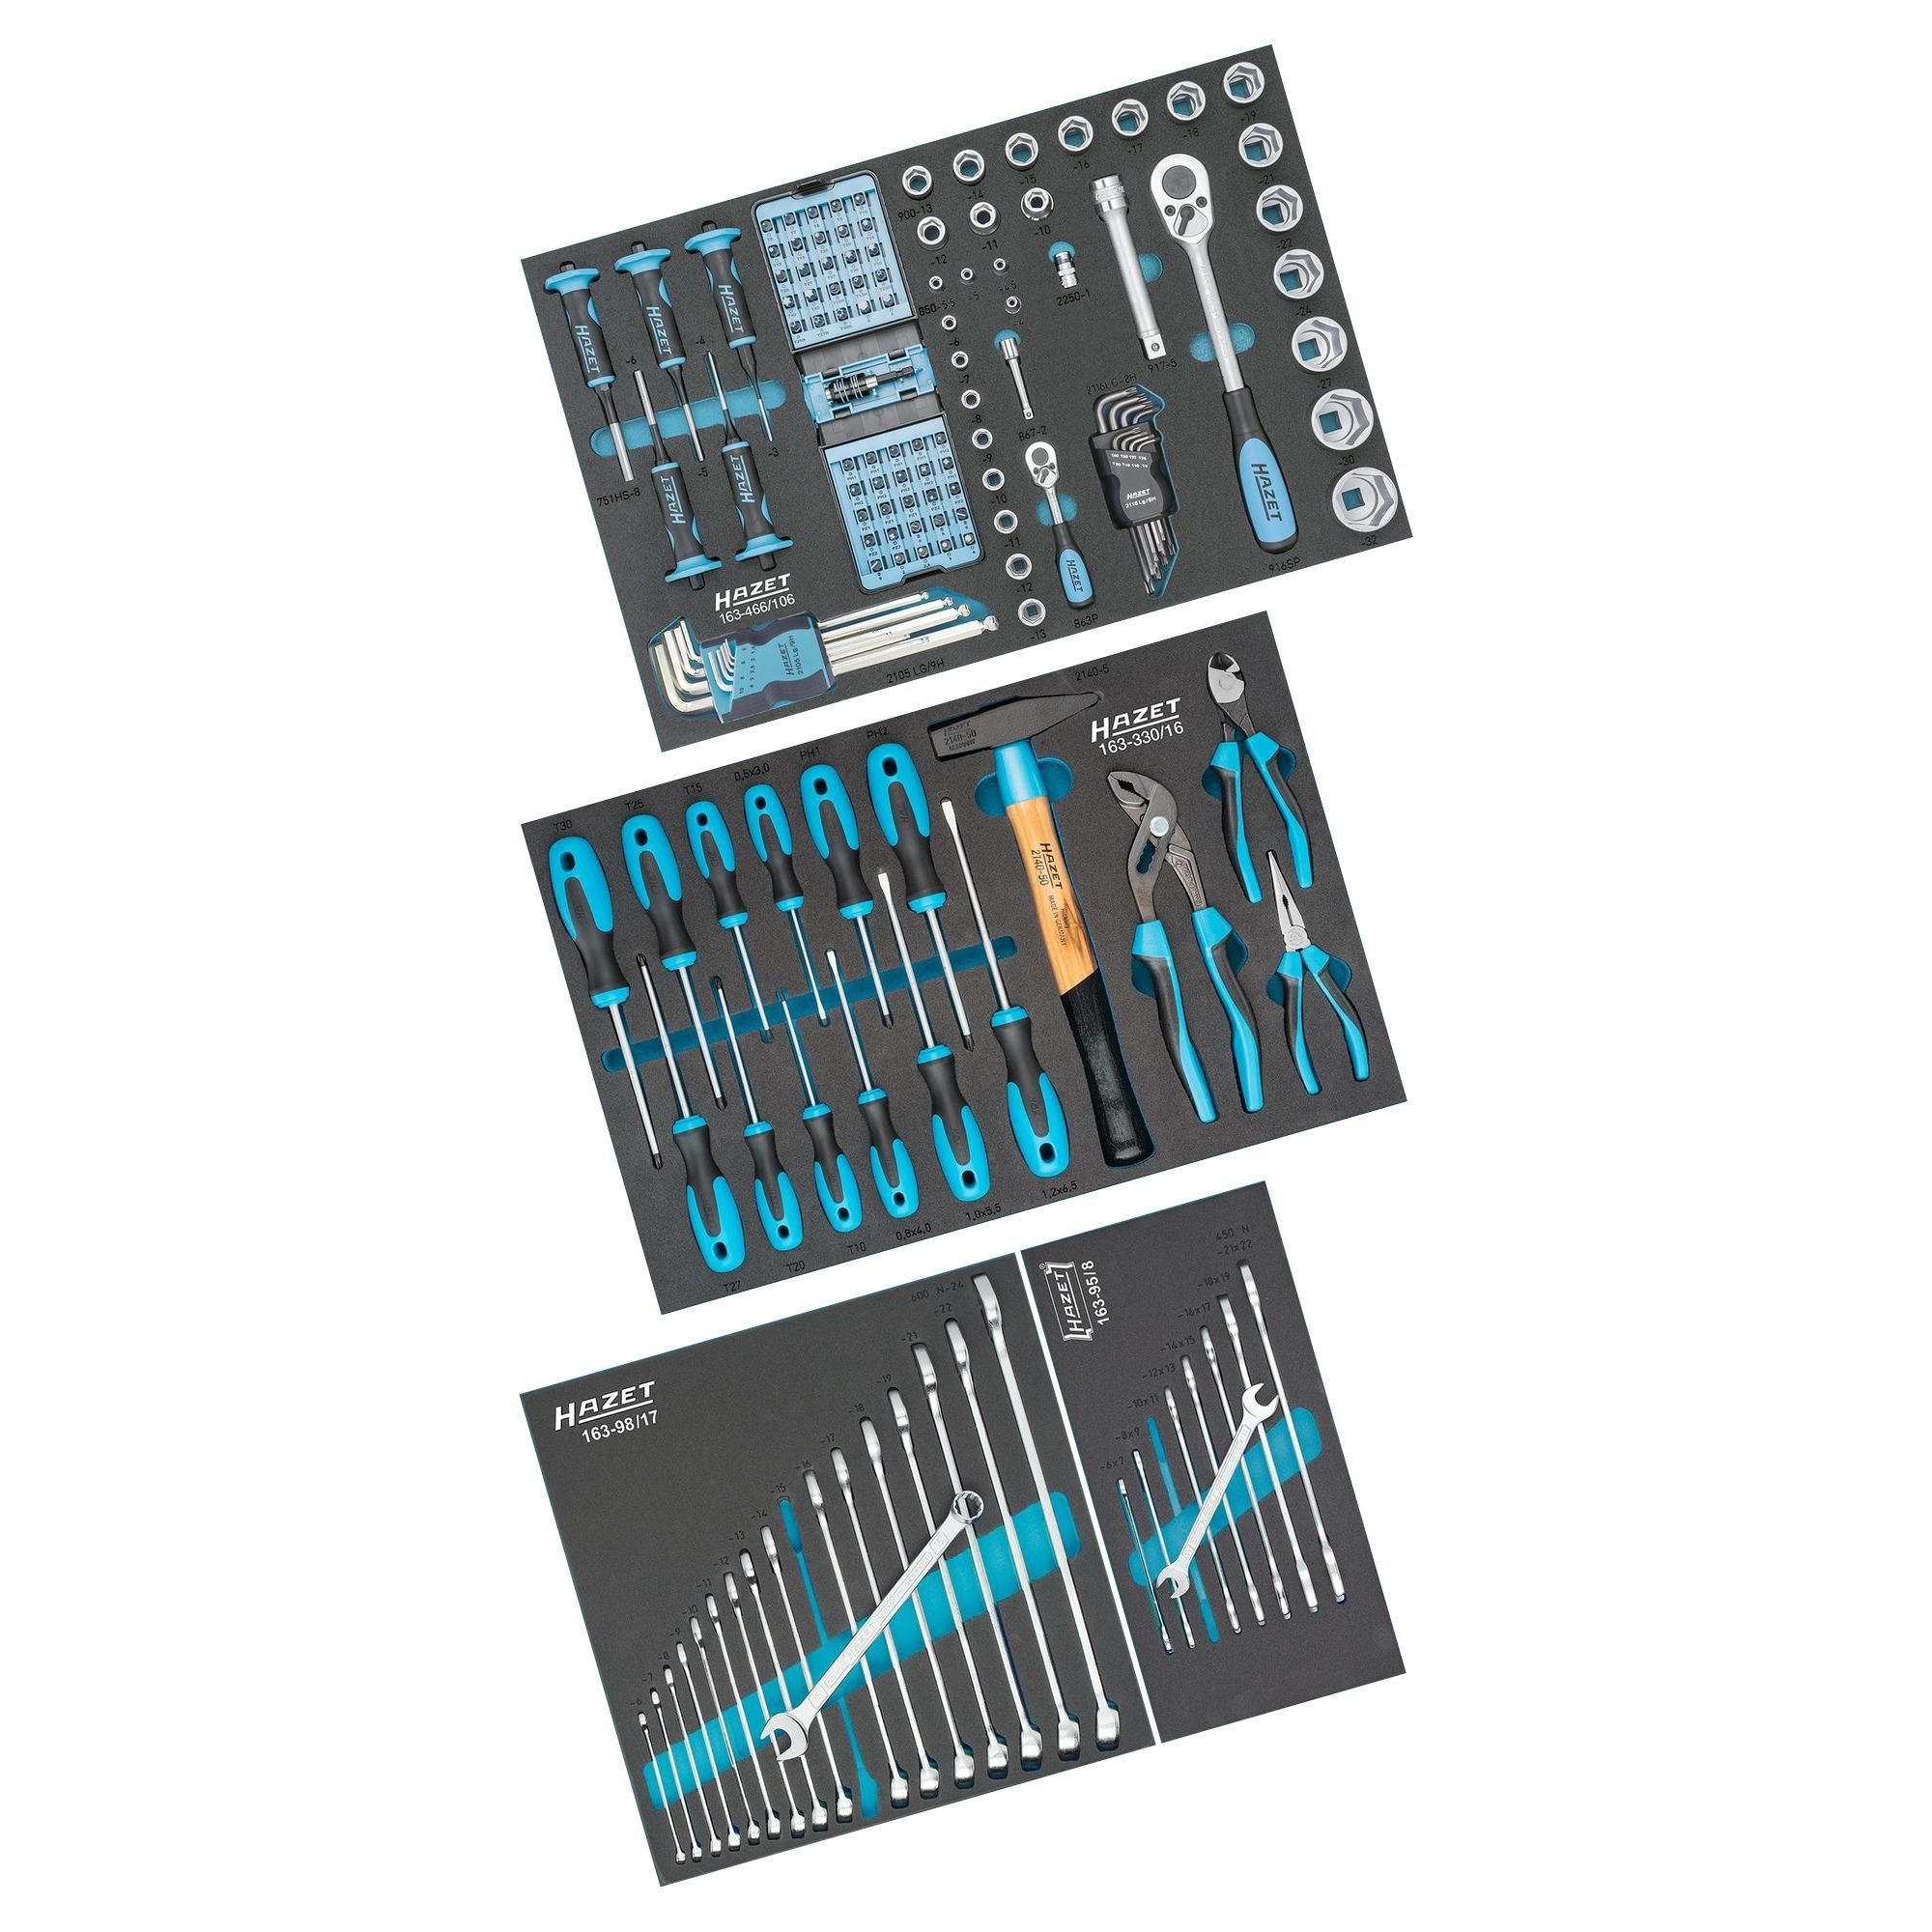 cfdf59ea96be8f Hazet Werkzeug Sortiment 0-178N/147, Werkzeug-Set schwarz/blau, 147-teilig